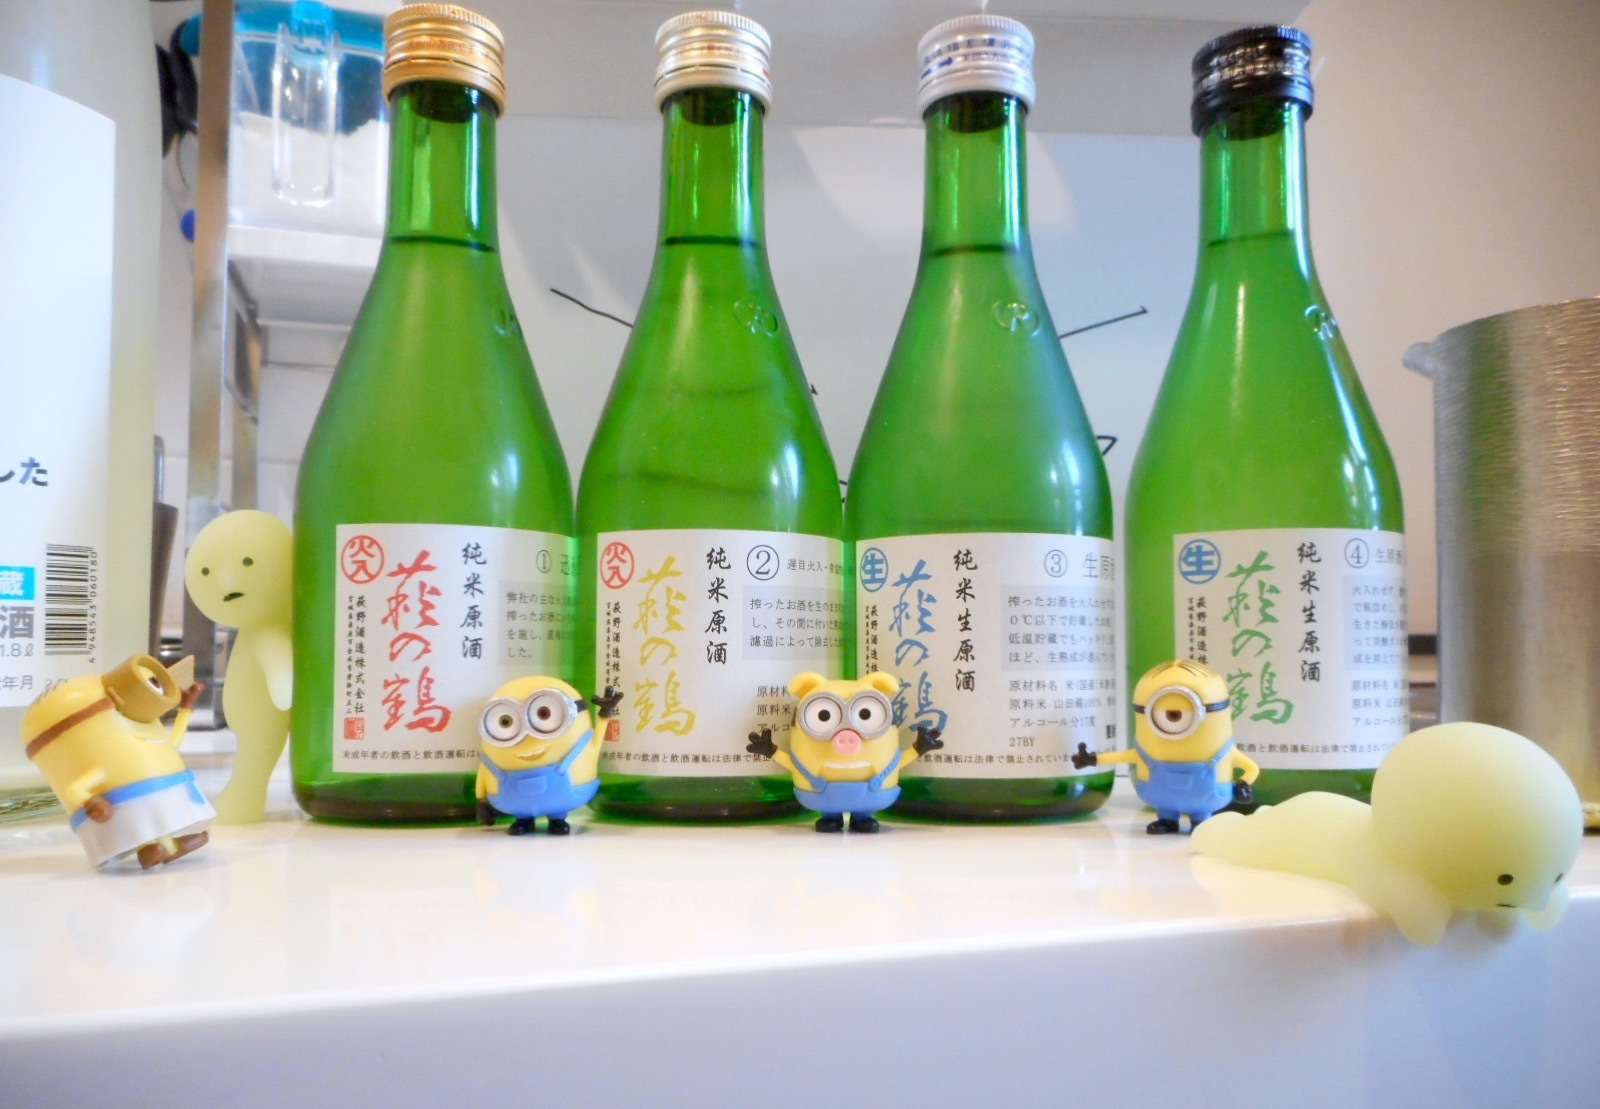 haginotsuru_kikizake_set27by3.jpg